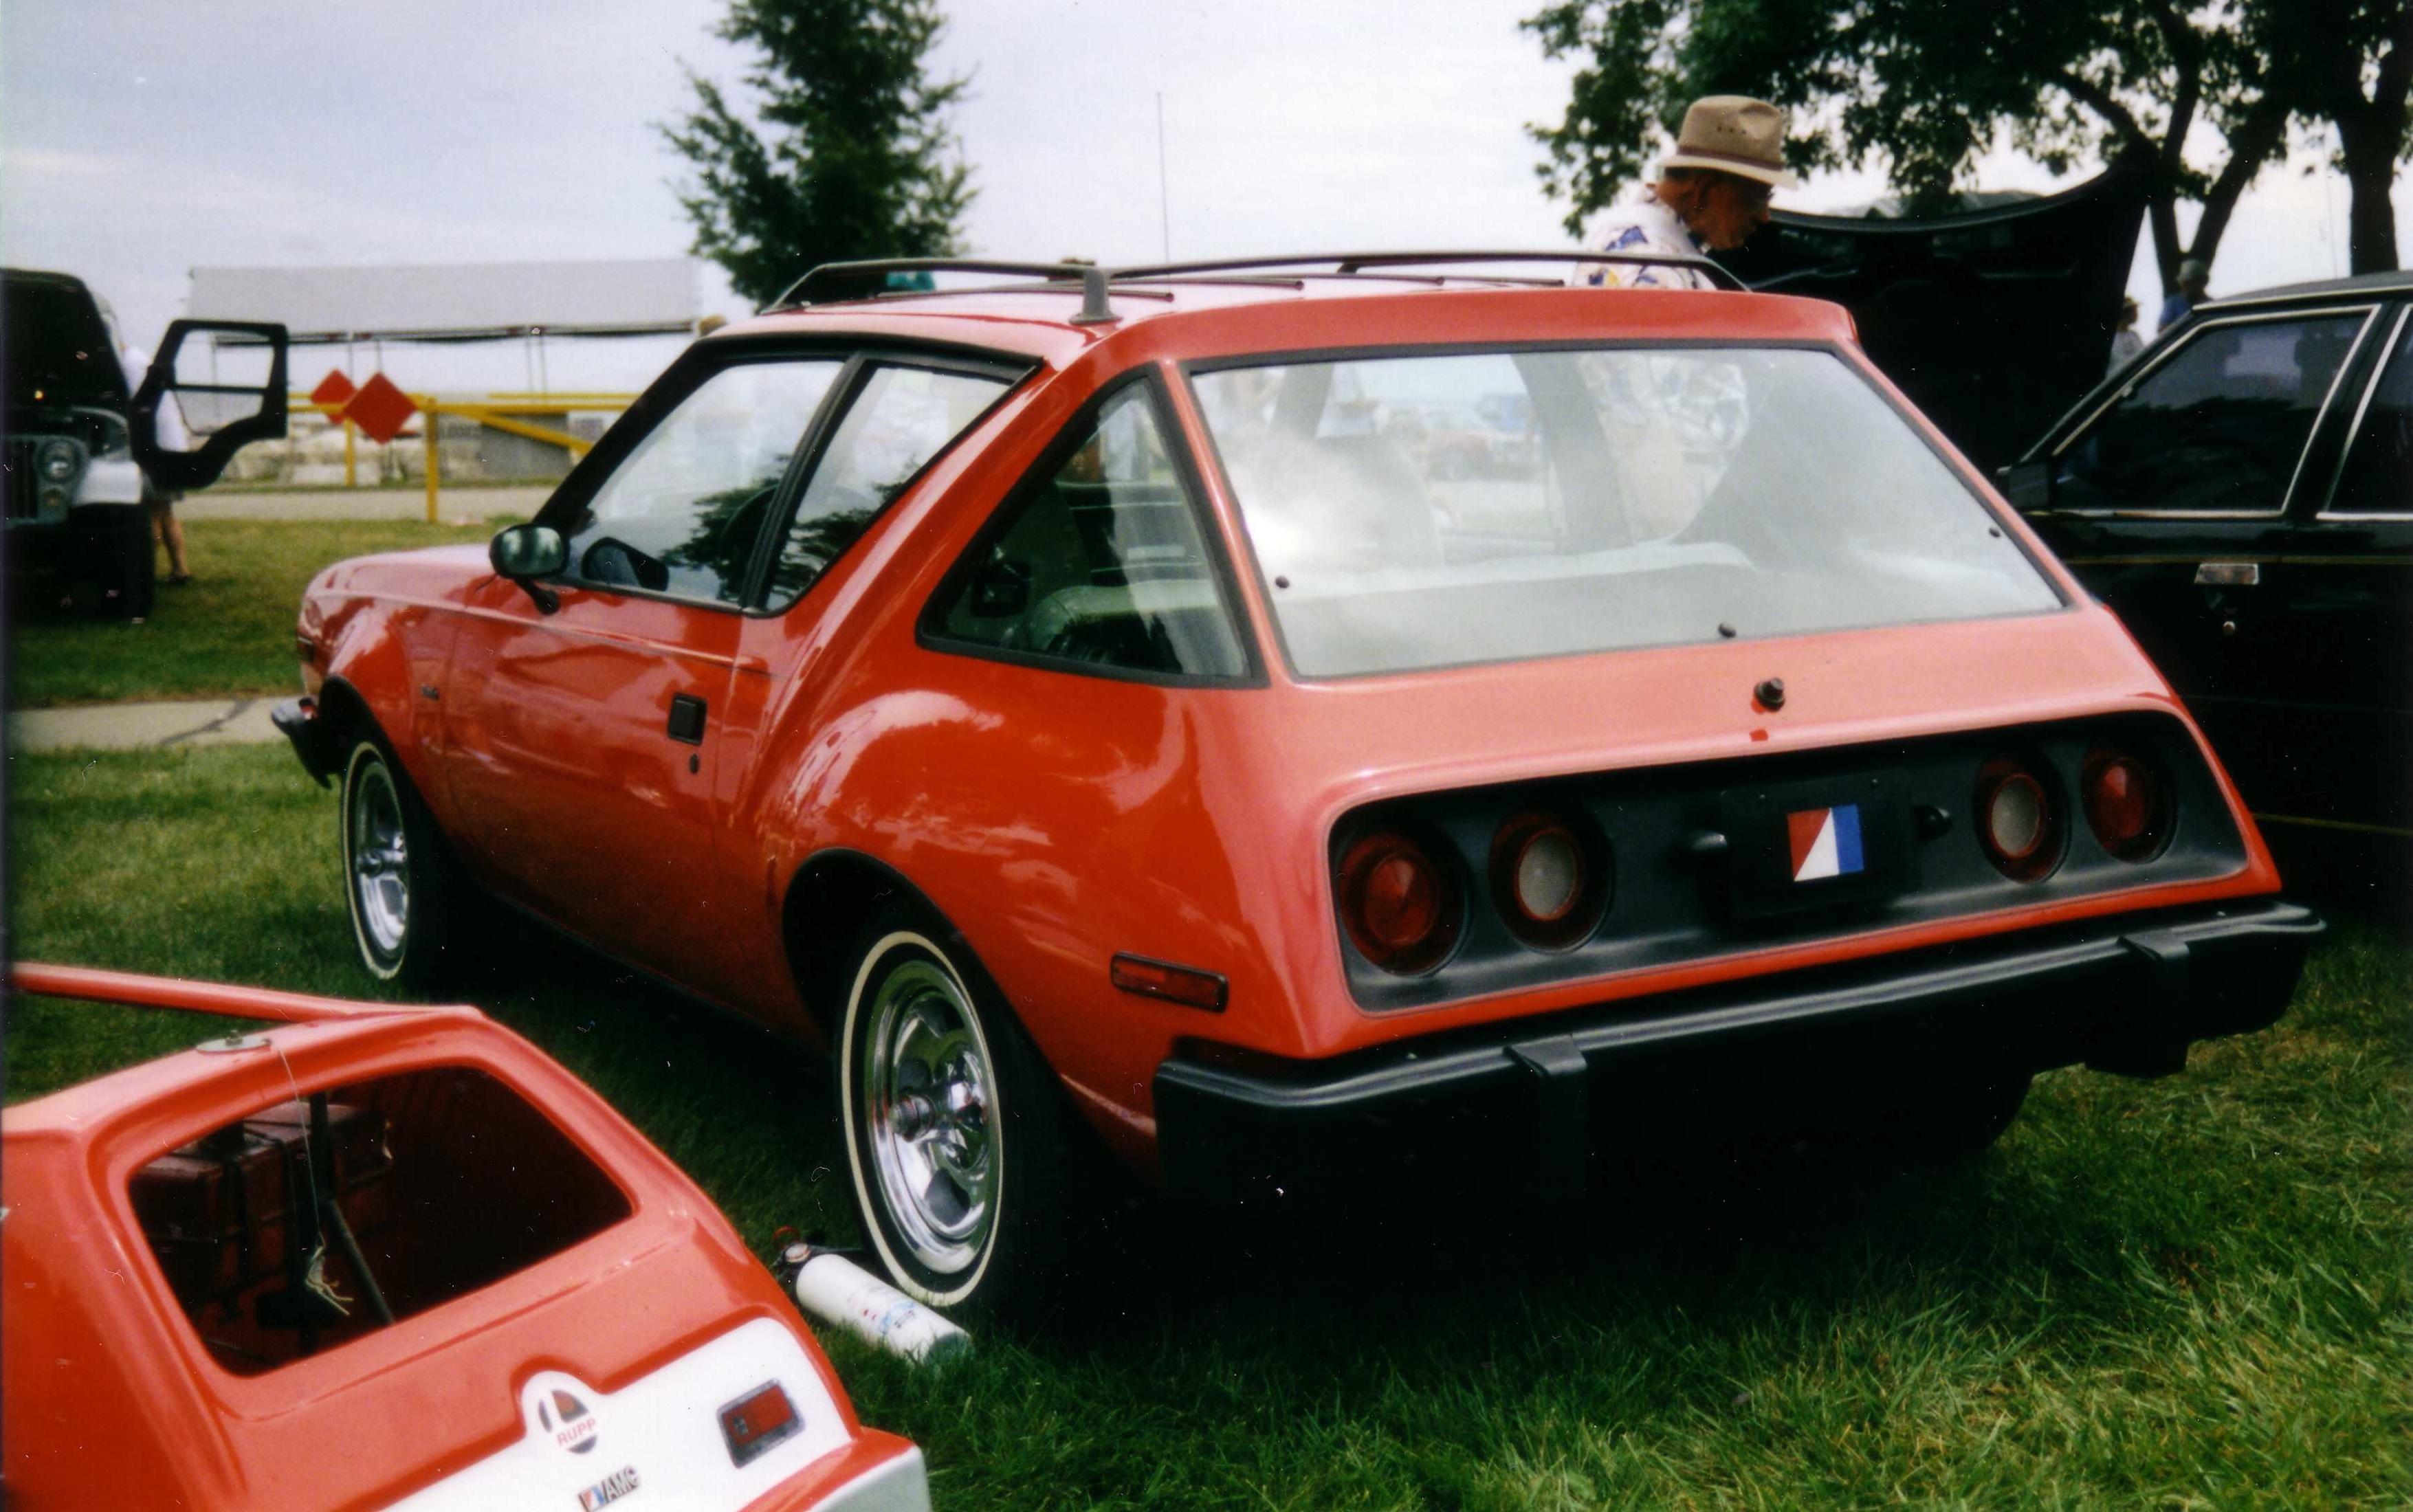 file amc gremlin xp 1974 concept car kenosha wikimedia commons. Black Bedroom Furniture Sets. Home Design Ideas